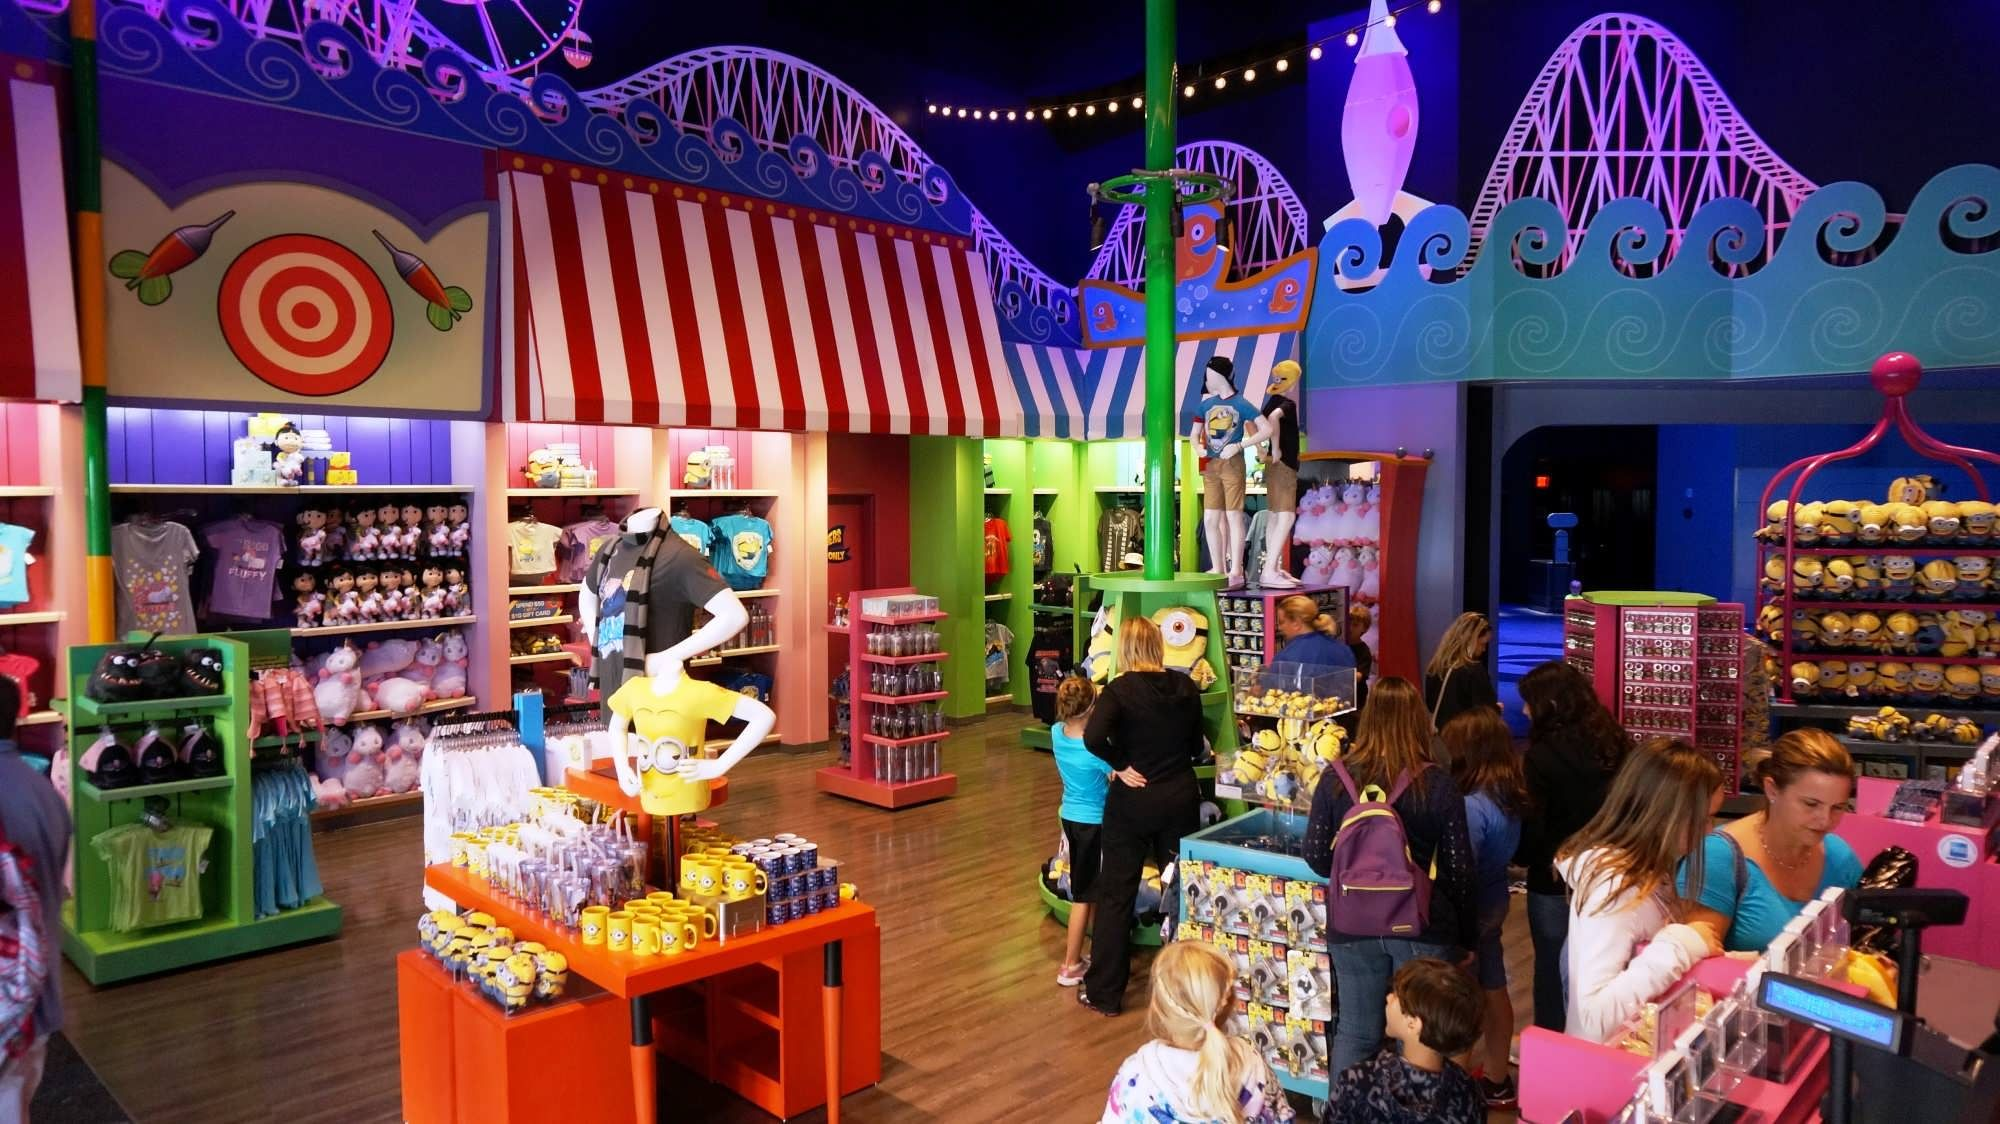 THE BIG 5 Top five gift shops at Universal Orlando